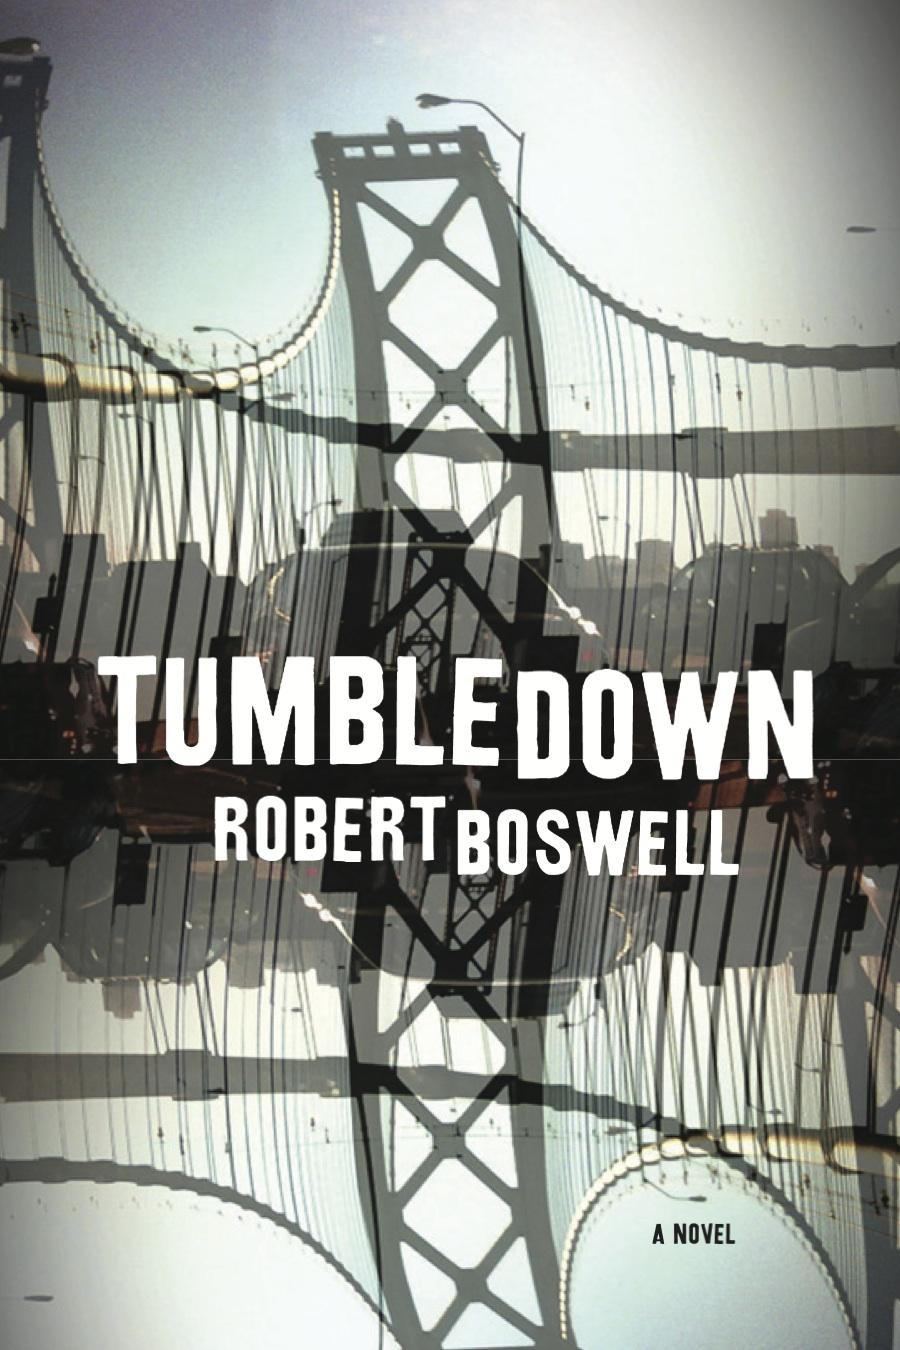 Tumbledown-FINAL copy.jpg